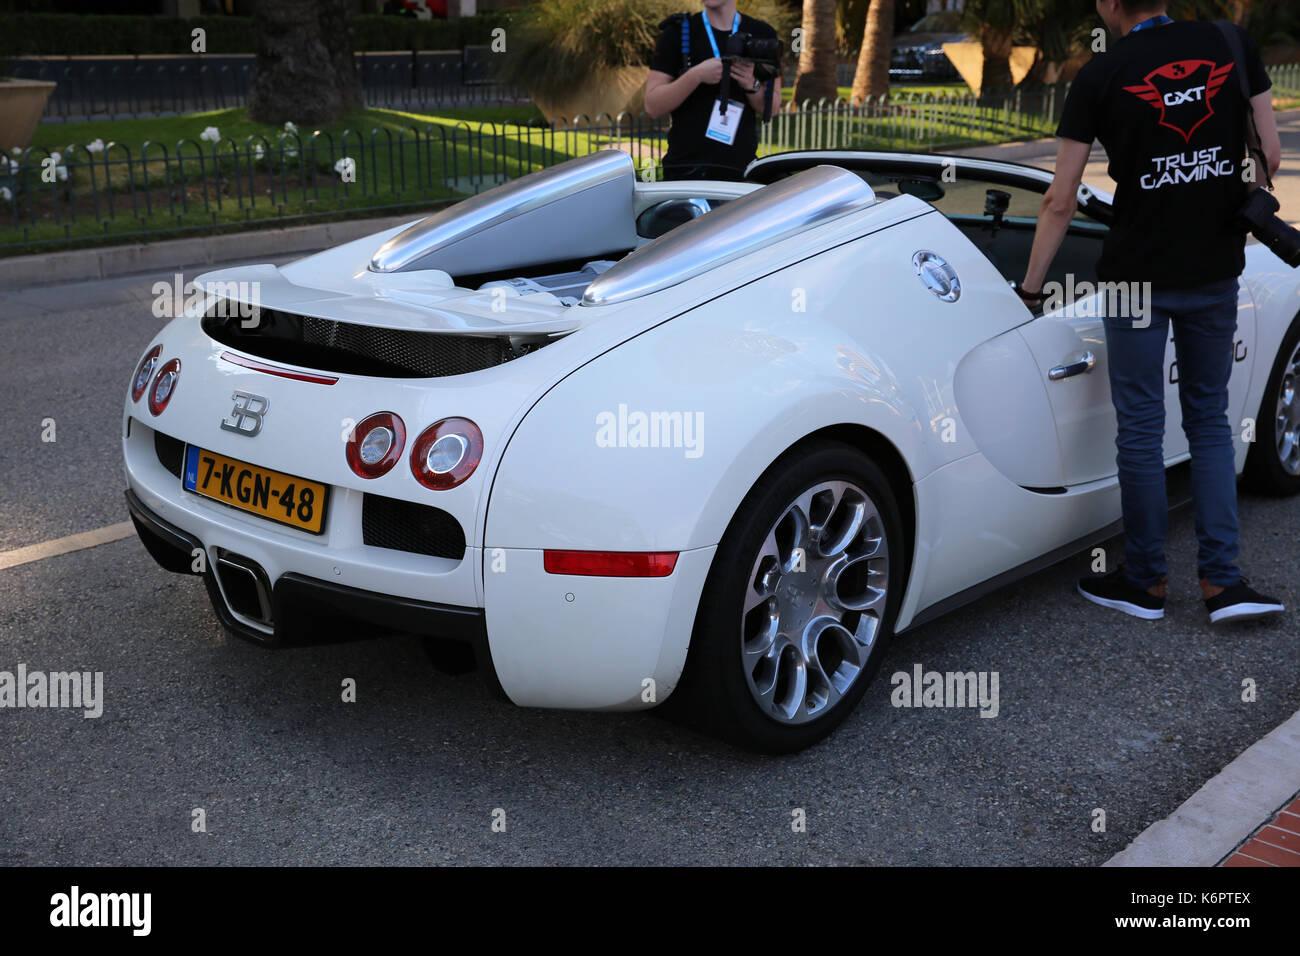 Monte Carlo, Monaco   May 17, 2016: White Supercar Bugatti Veyron 16.4